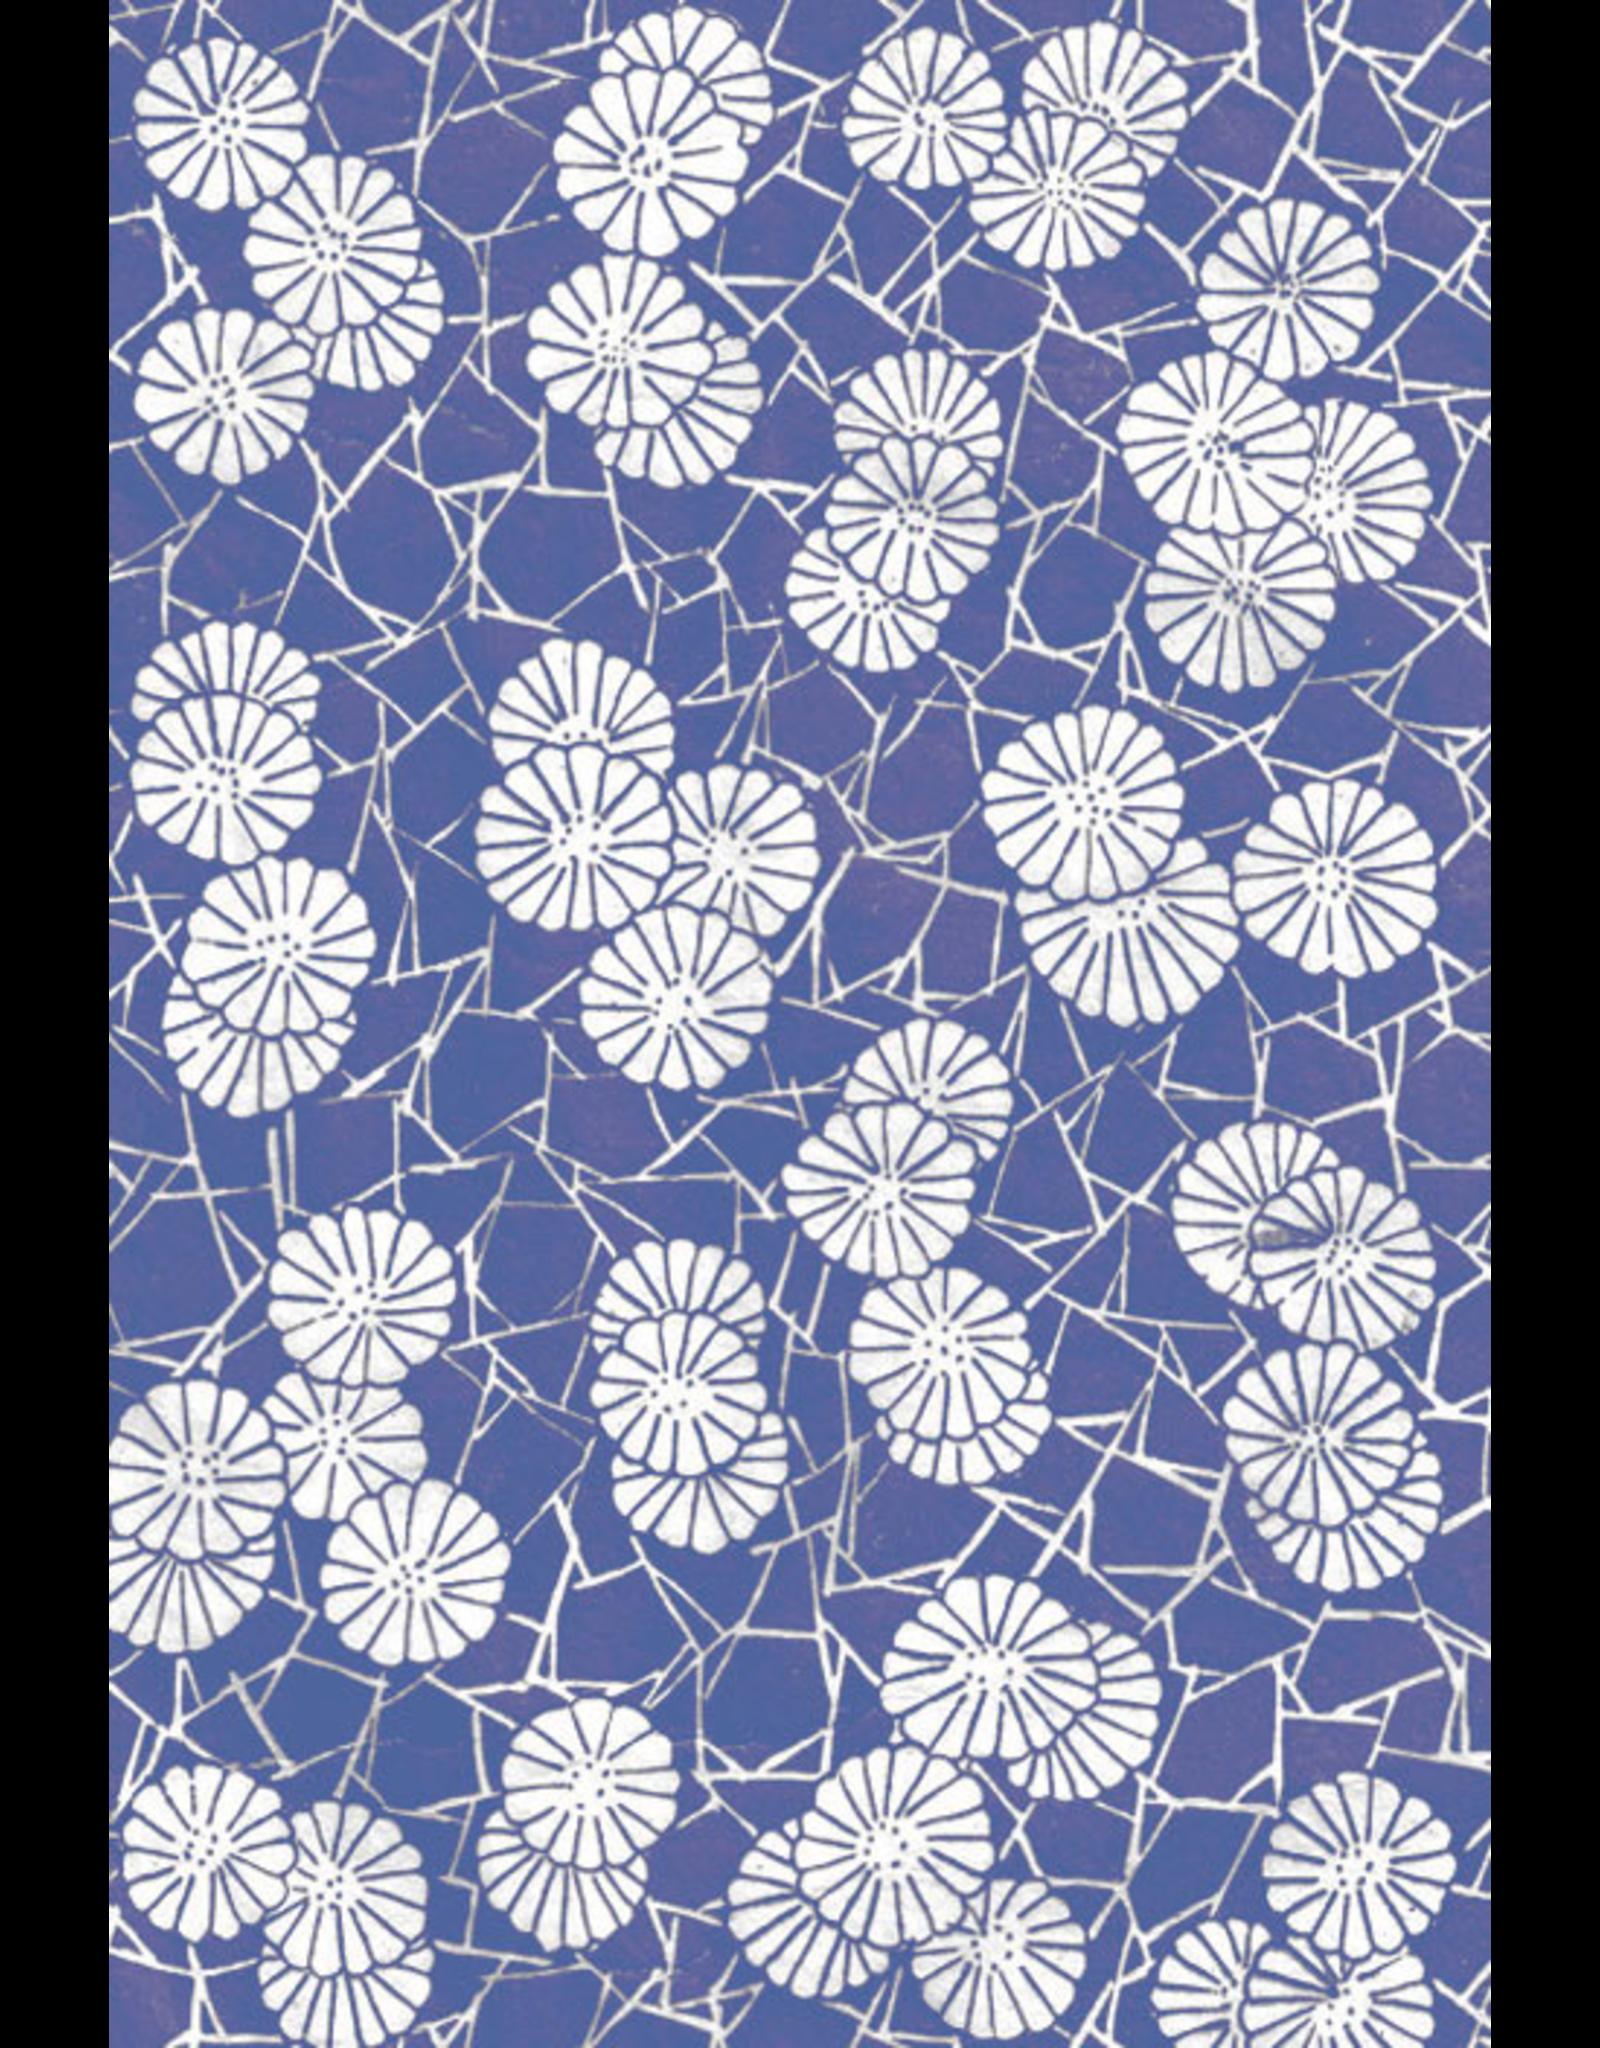 Sanbao Pattern decal 4 (underglaze decal - 16cm x 22cm)